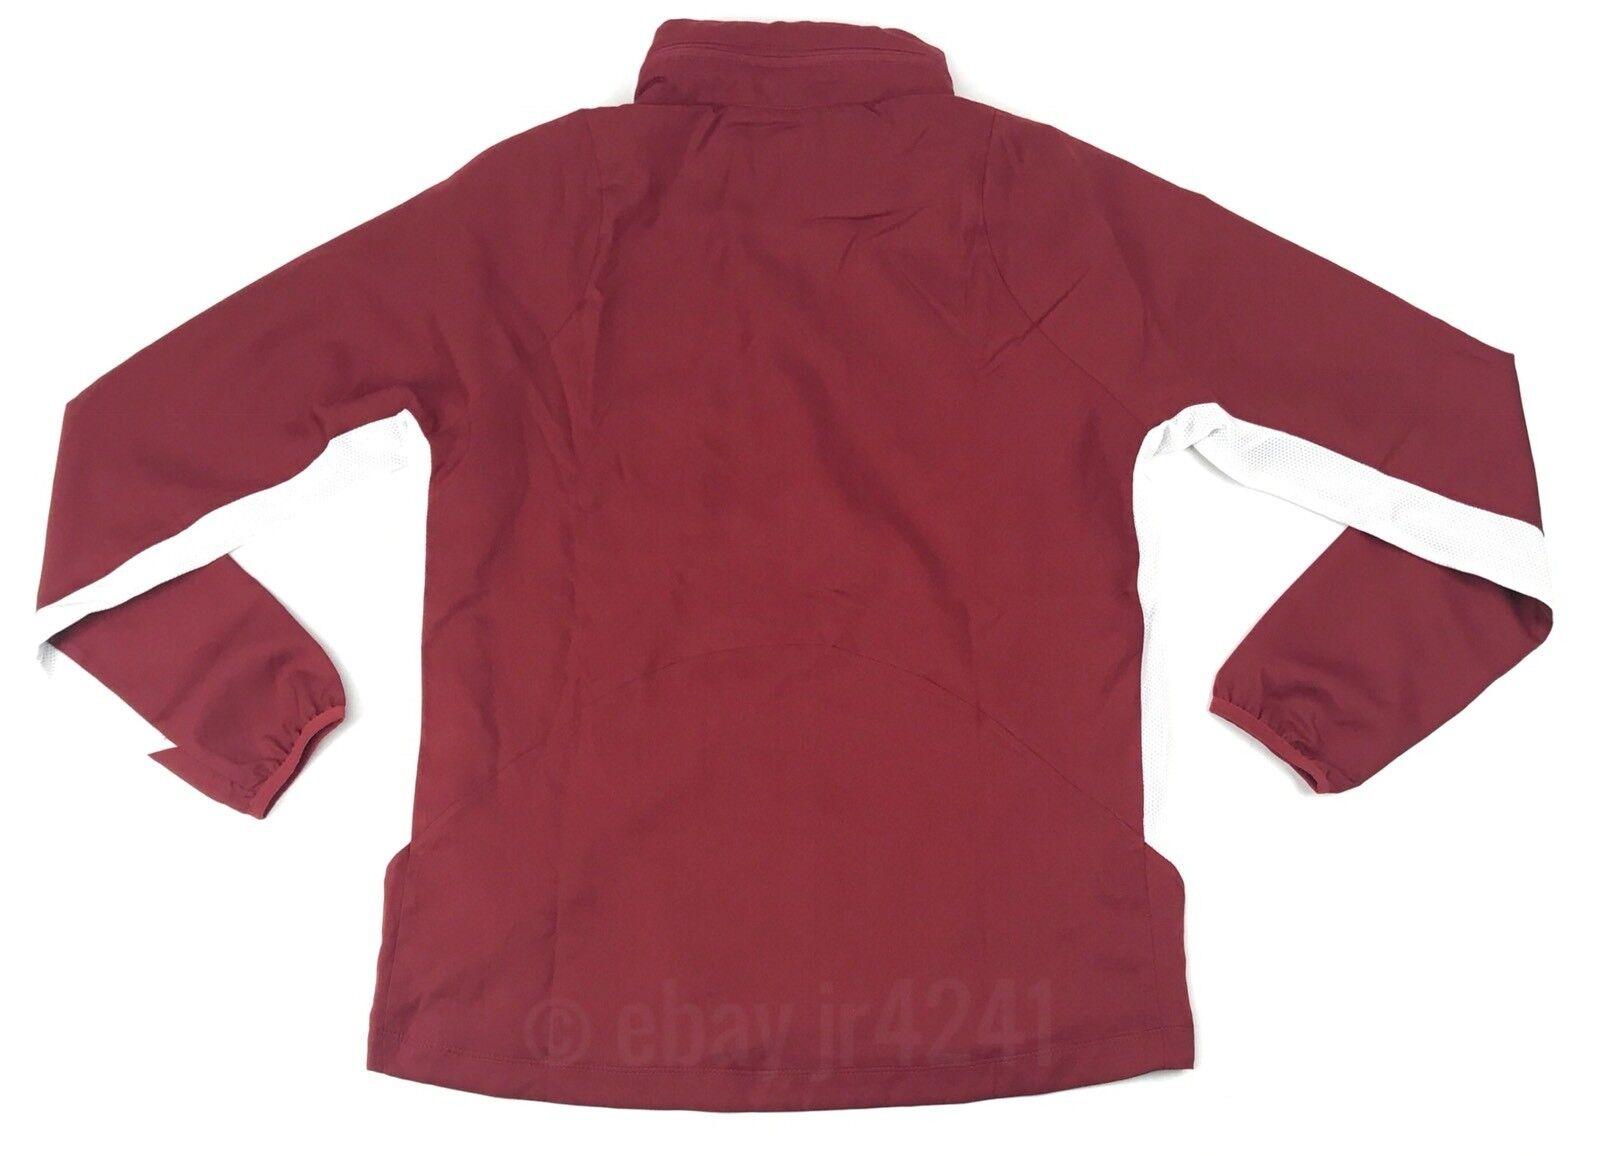 2992d0ff18240 Nike Alabama Crimson Tide Dry Full-zip Jacket Women s Medium Red ...